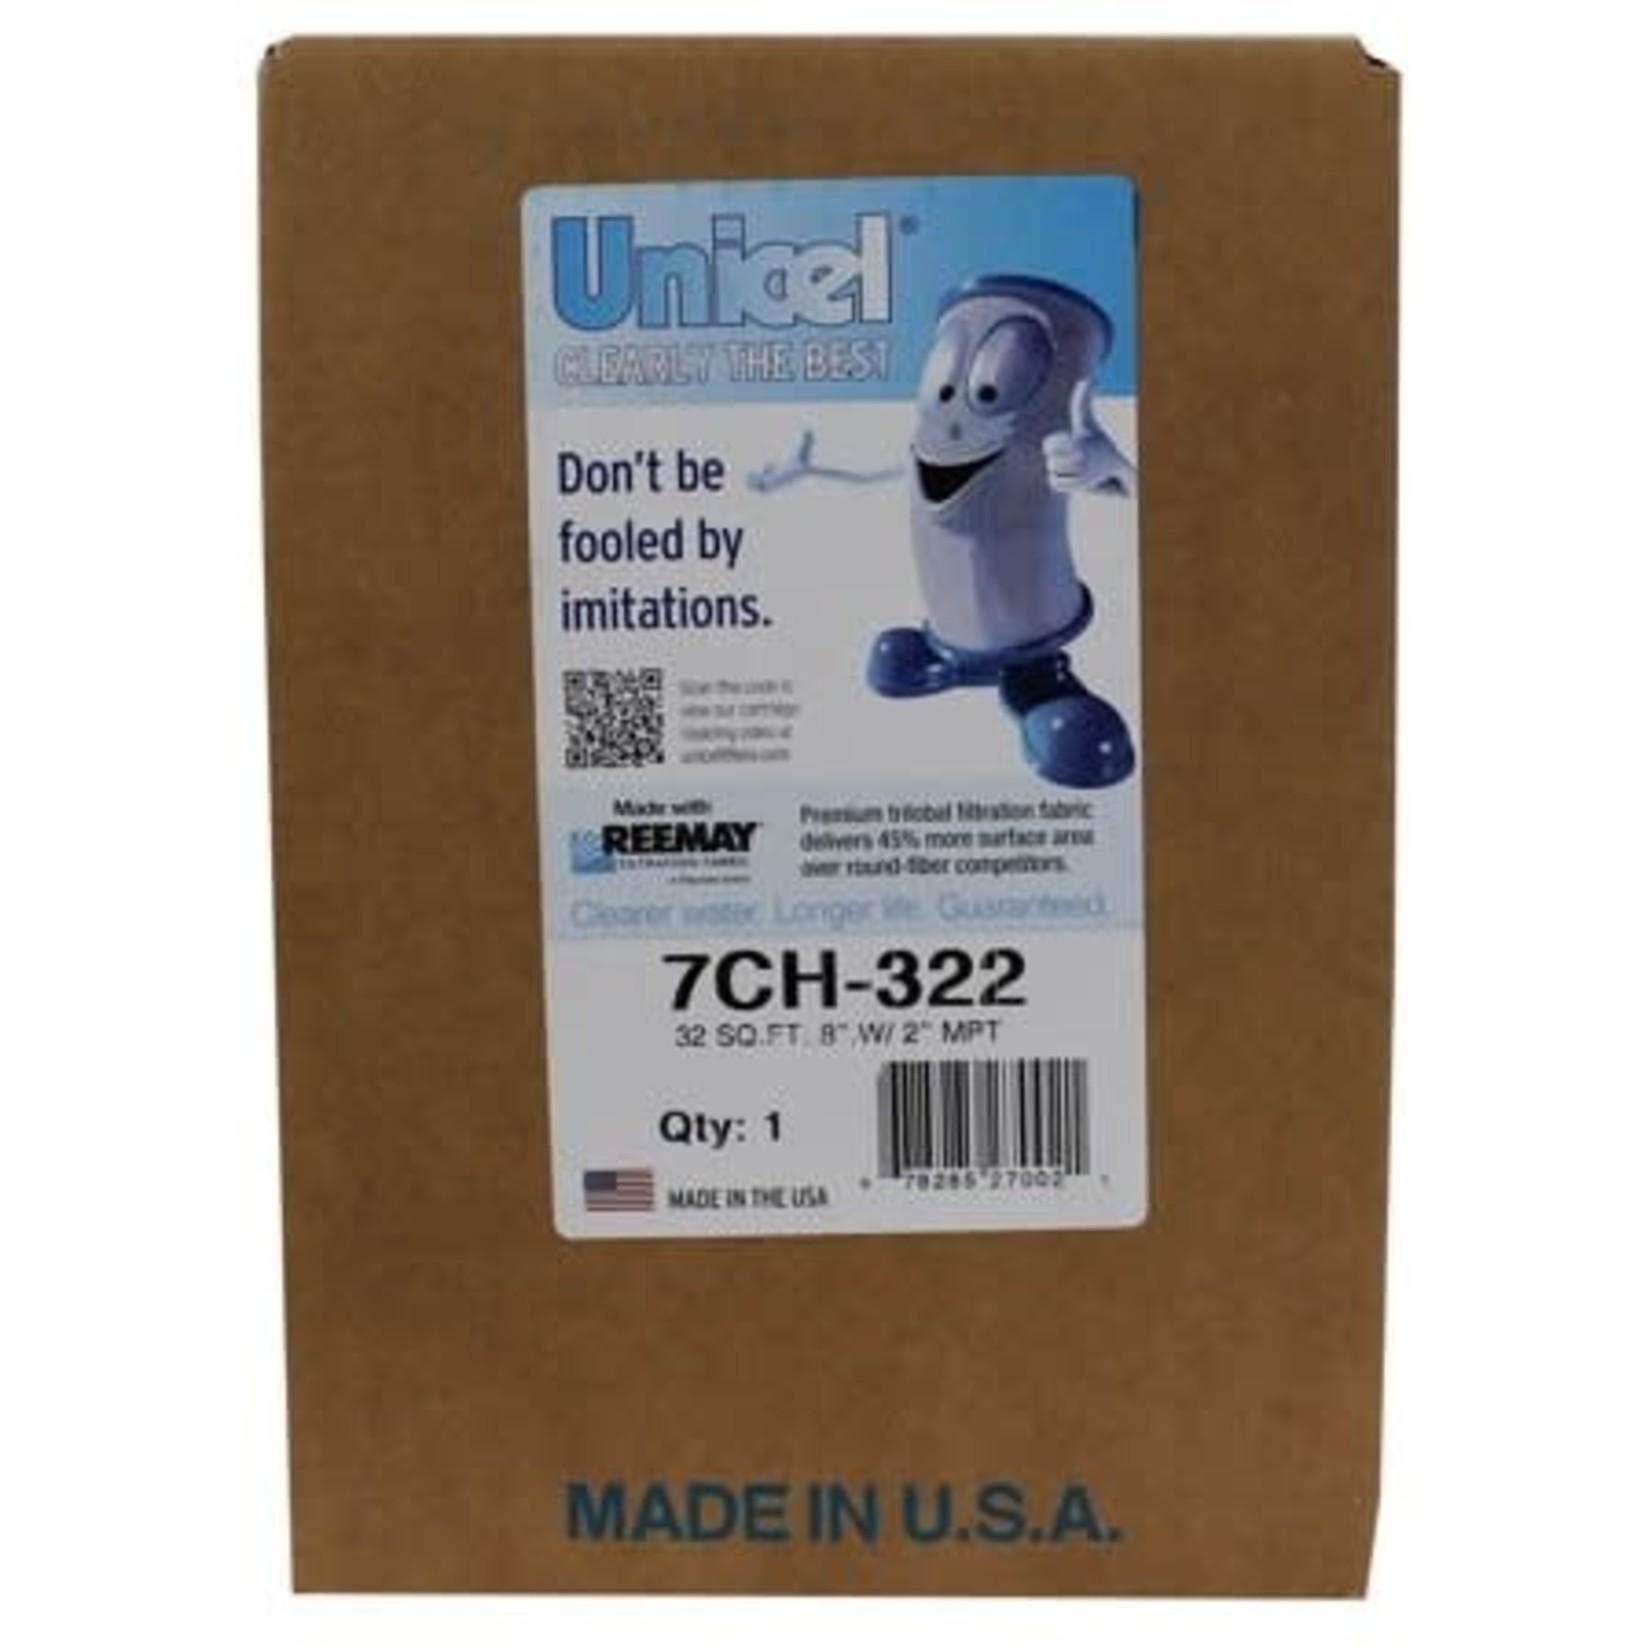 Unicel CARTRIDGE SPA 7CH-322